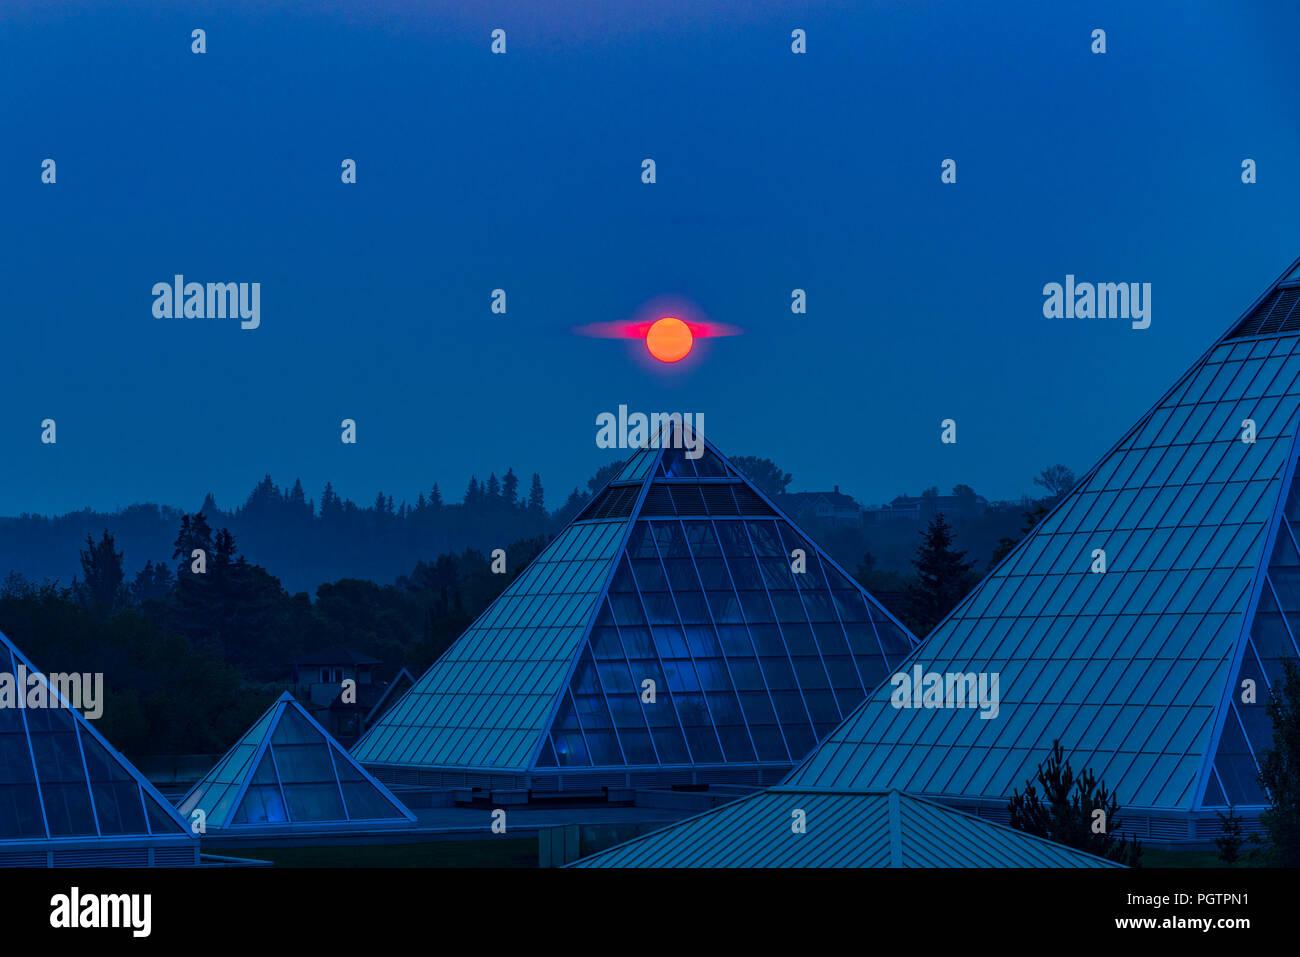 Soleil se lève à travers la fumée rempli ciel, Muttart Conservatory Pyramids, Edmonton, Alberta, Canada. Photo Stock